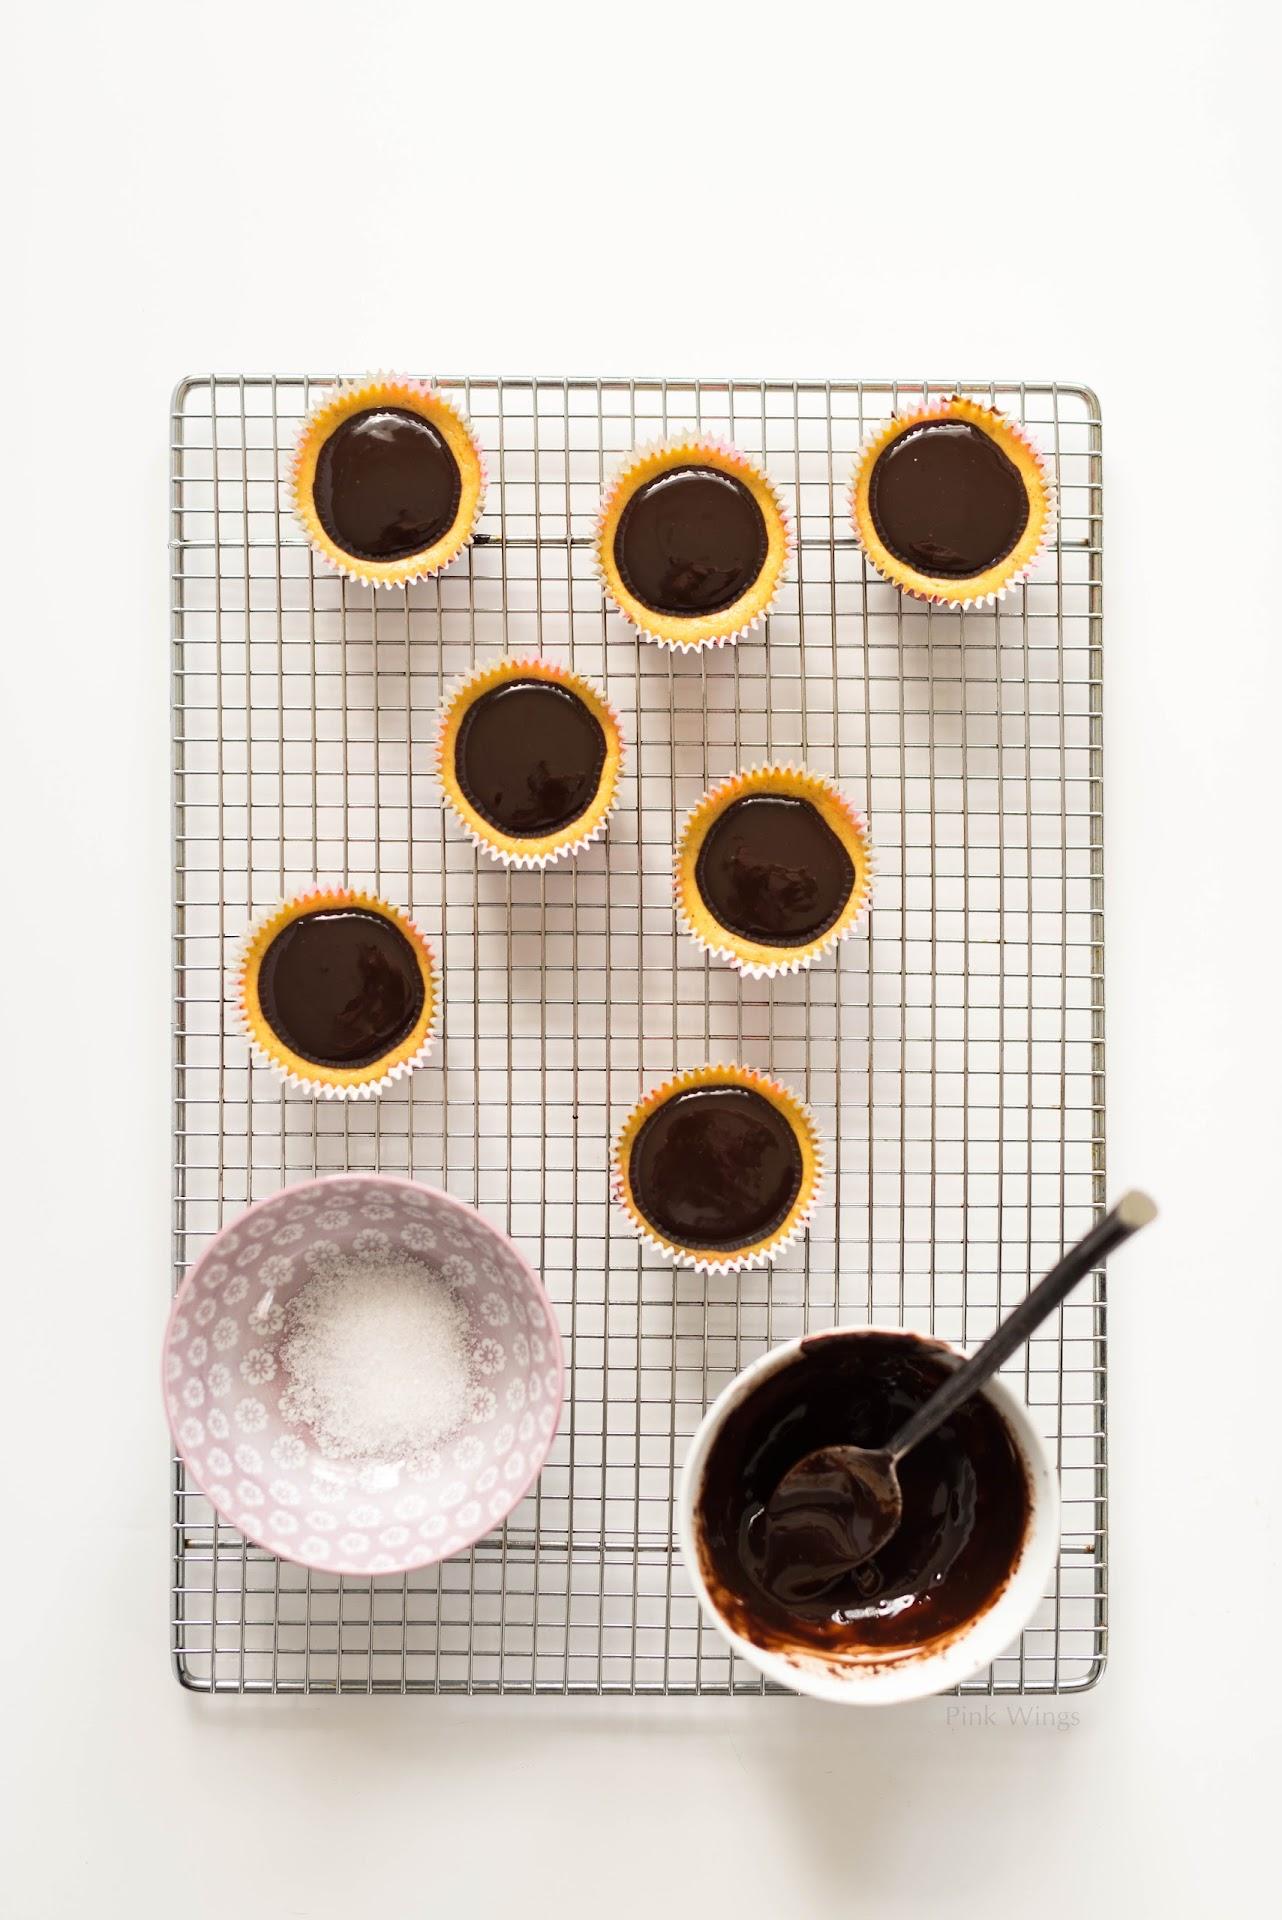 dark chocolate ganache, salted, pumpkin cheesecake, mini, small, individual, party dessert, autumn, fall, pumpkin, ginger cookies